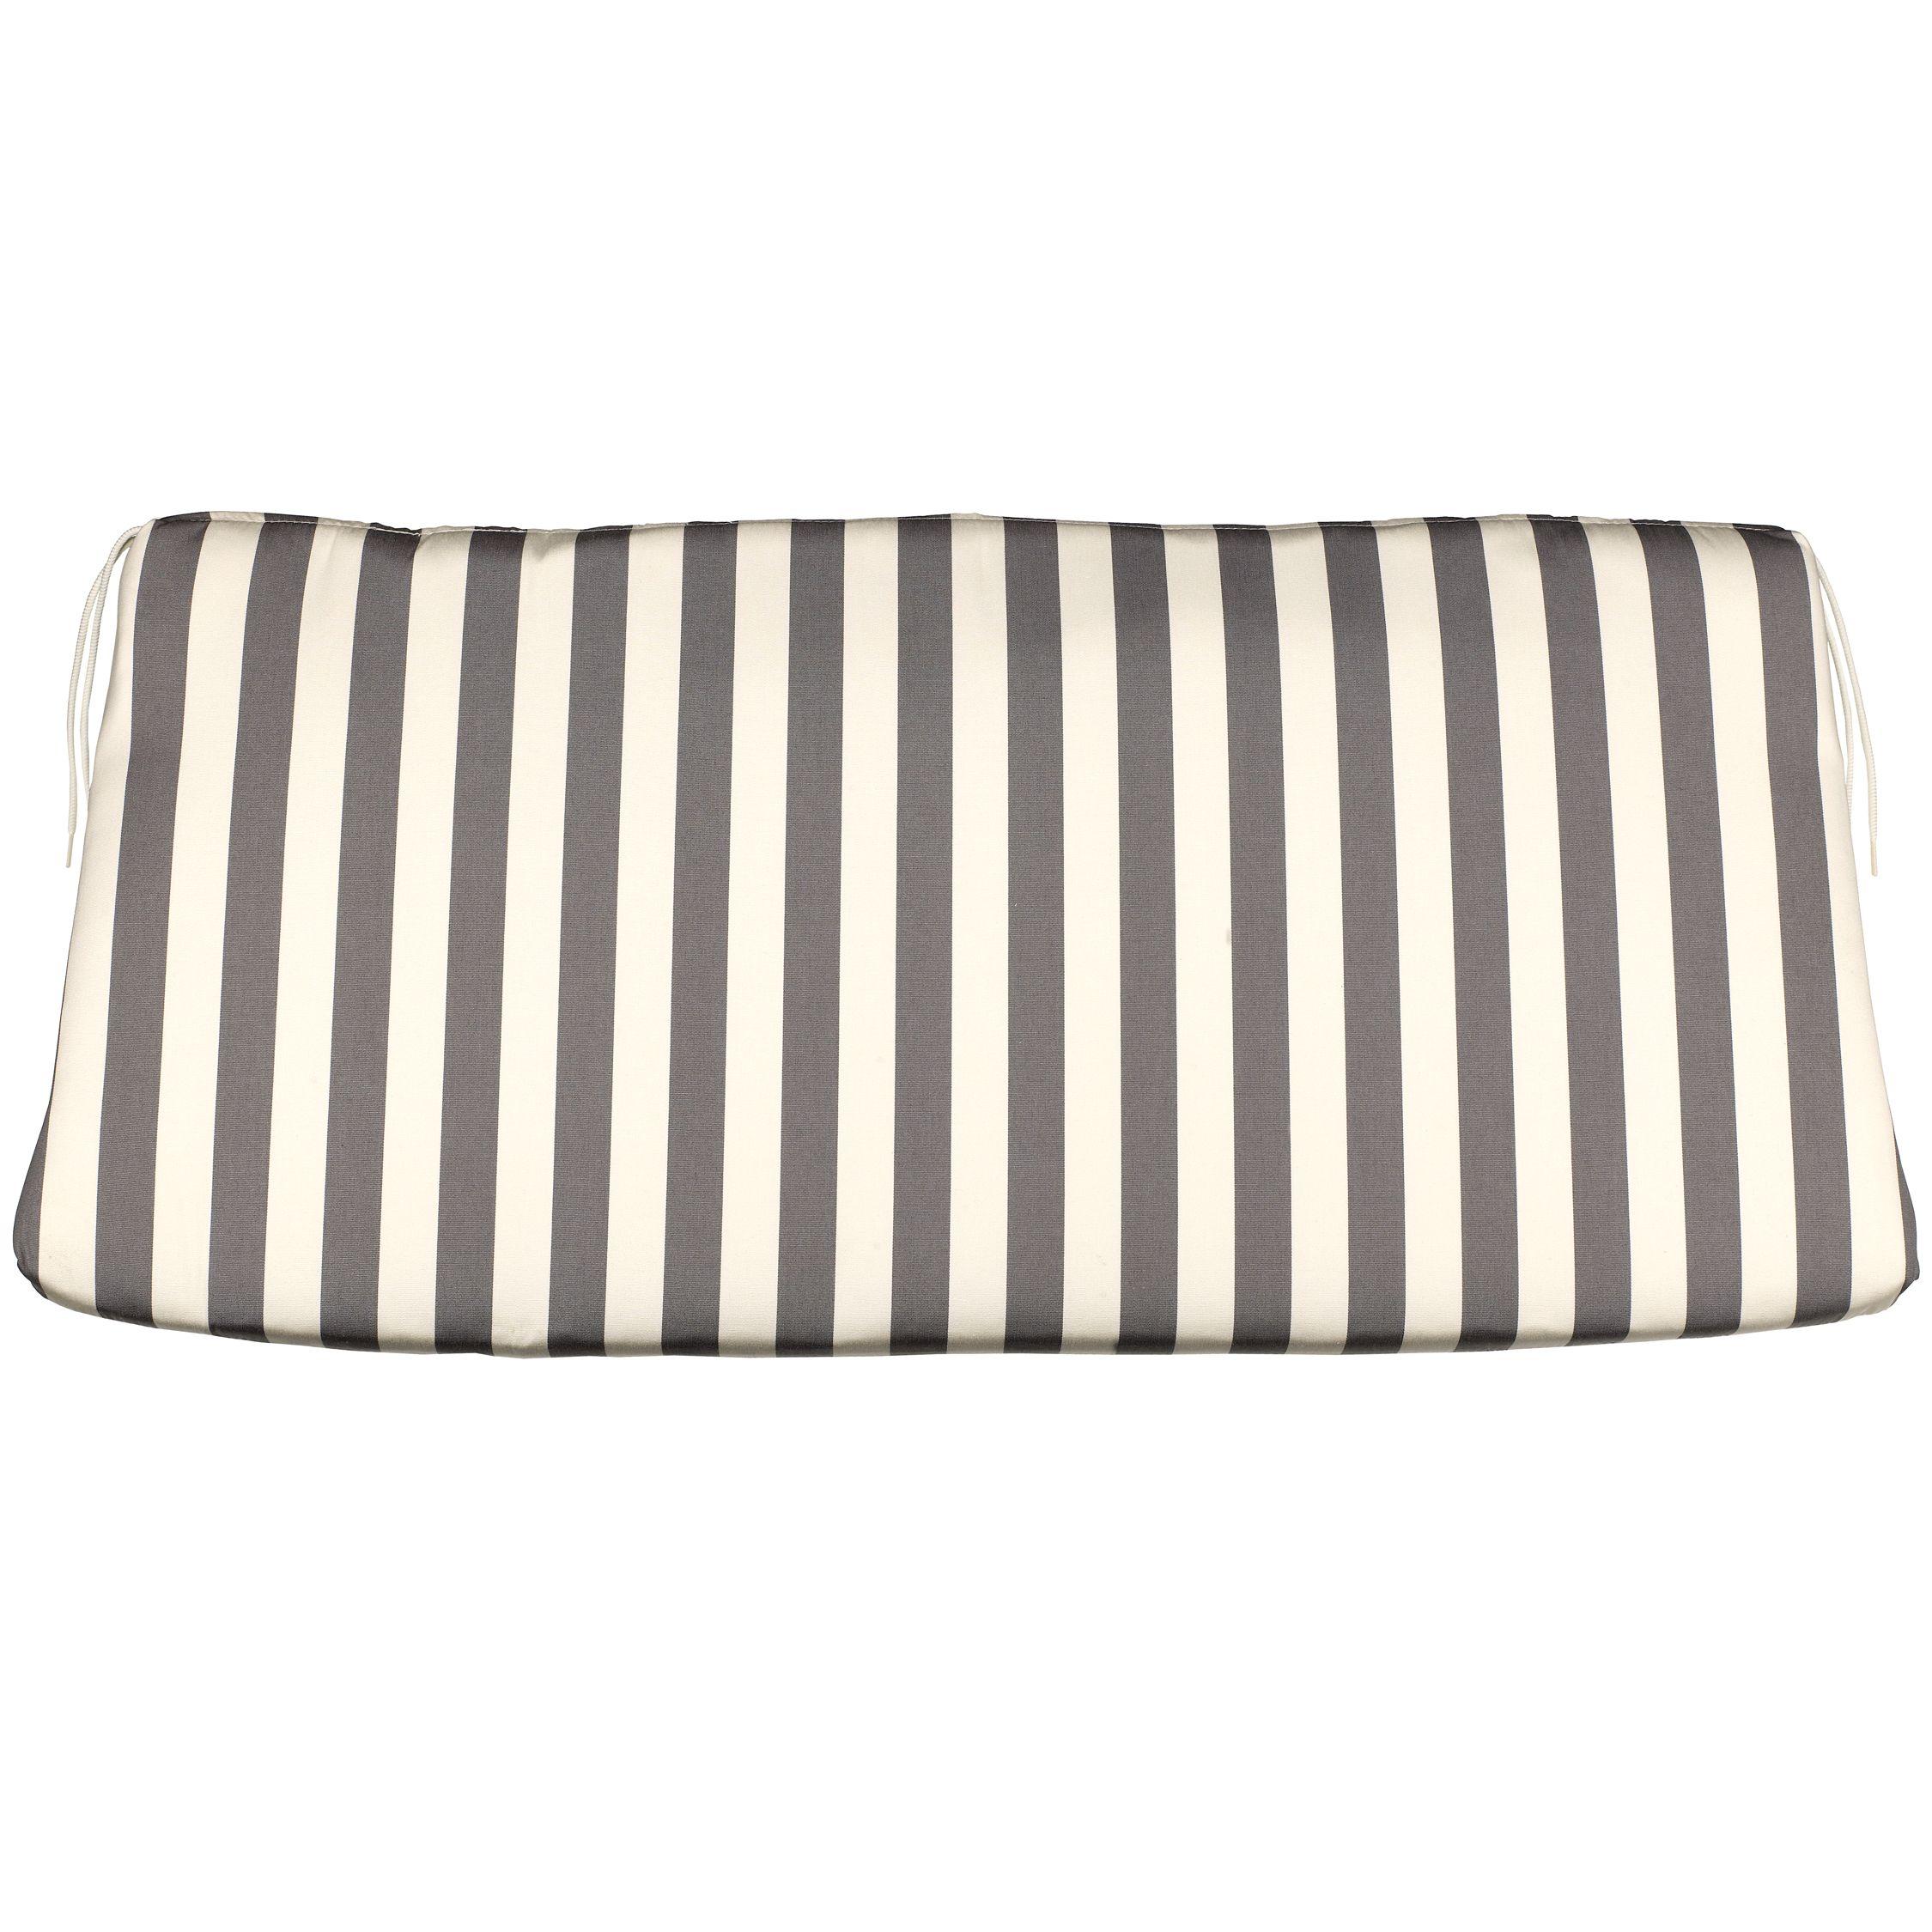 Royal Garden Classic Bench Cushion, Stripe